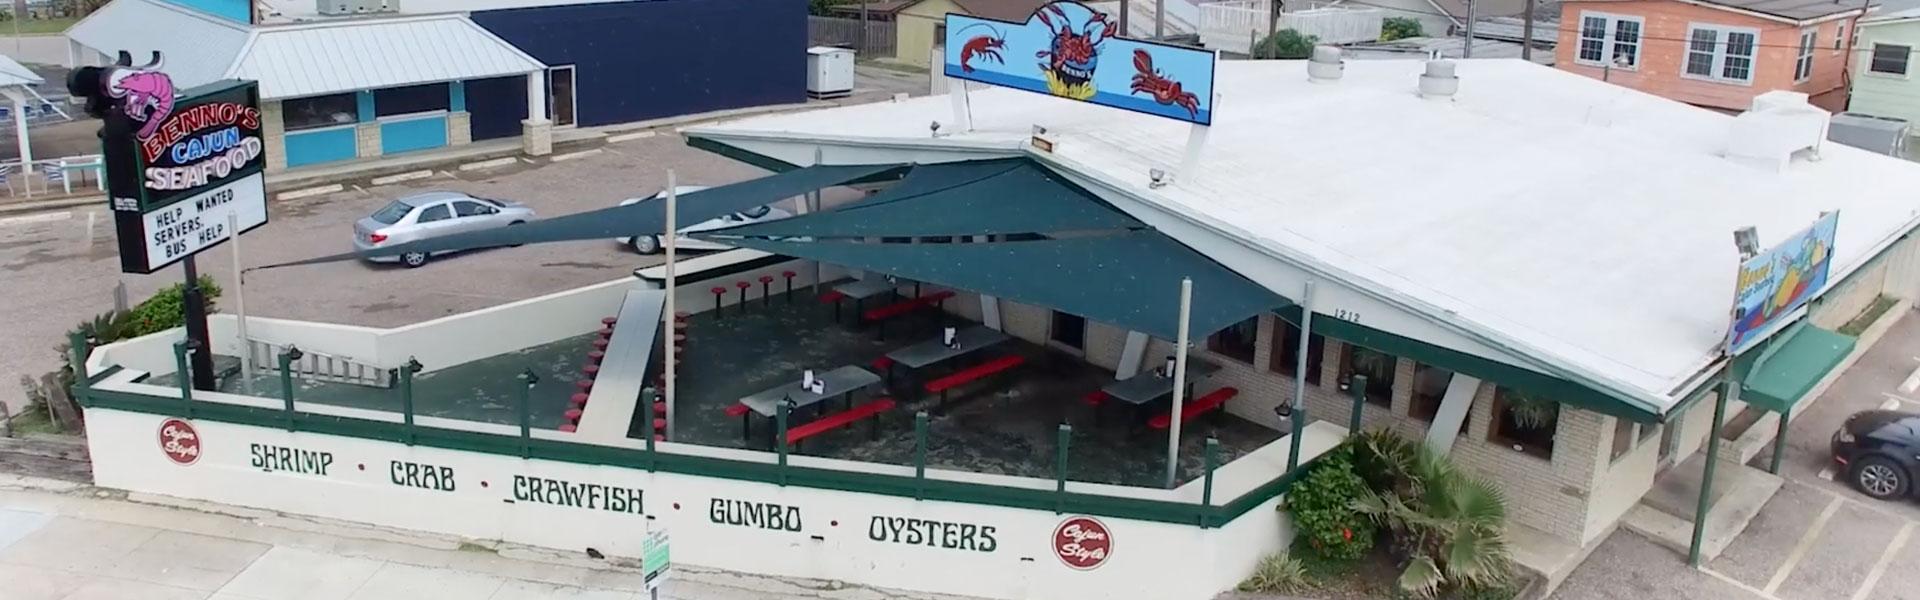 Benno's Cajun Seafood, Galveston, TX